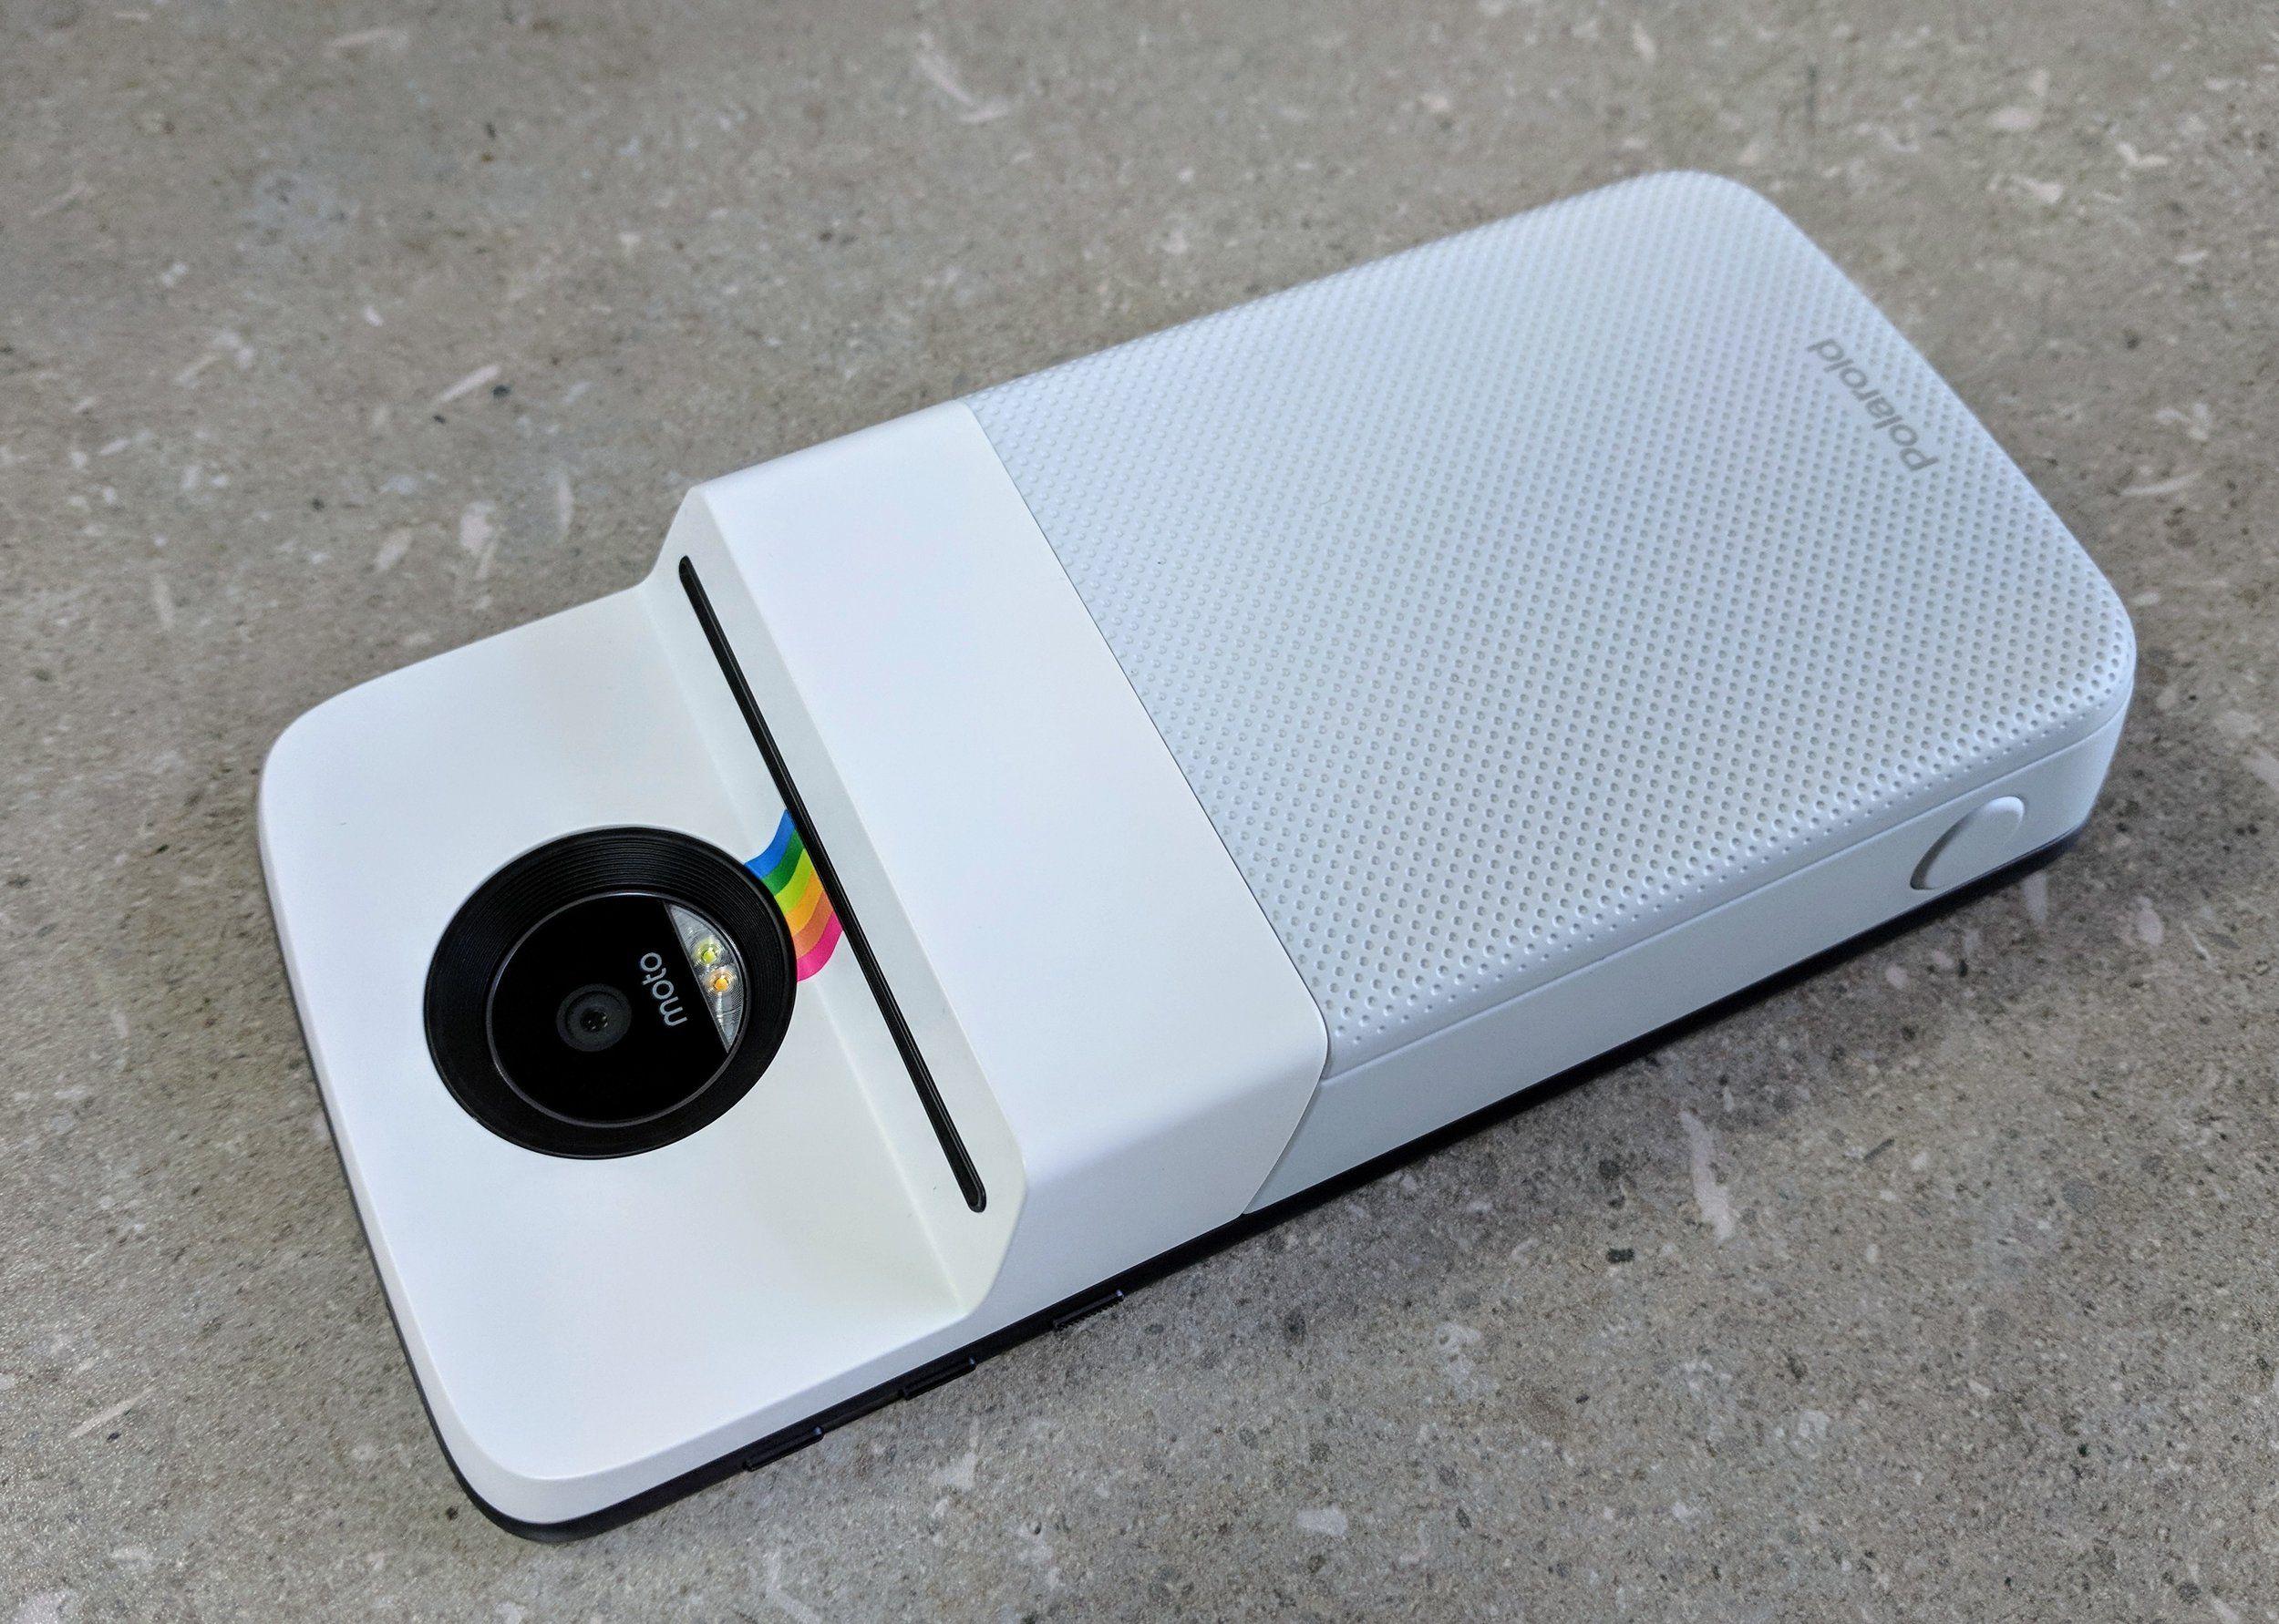 May 16 Motorola Moto Mod Polaroid Insta-Share Printer Review